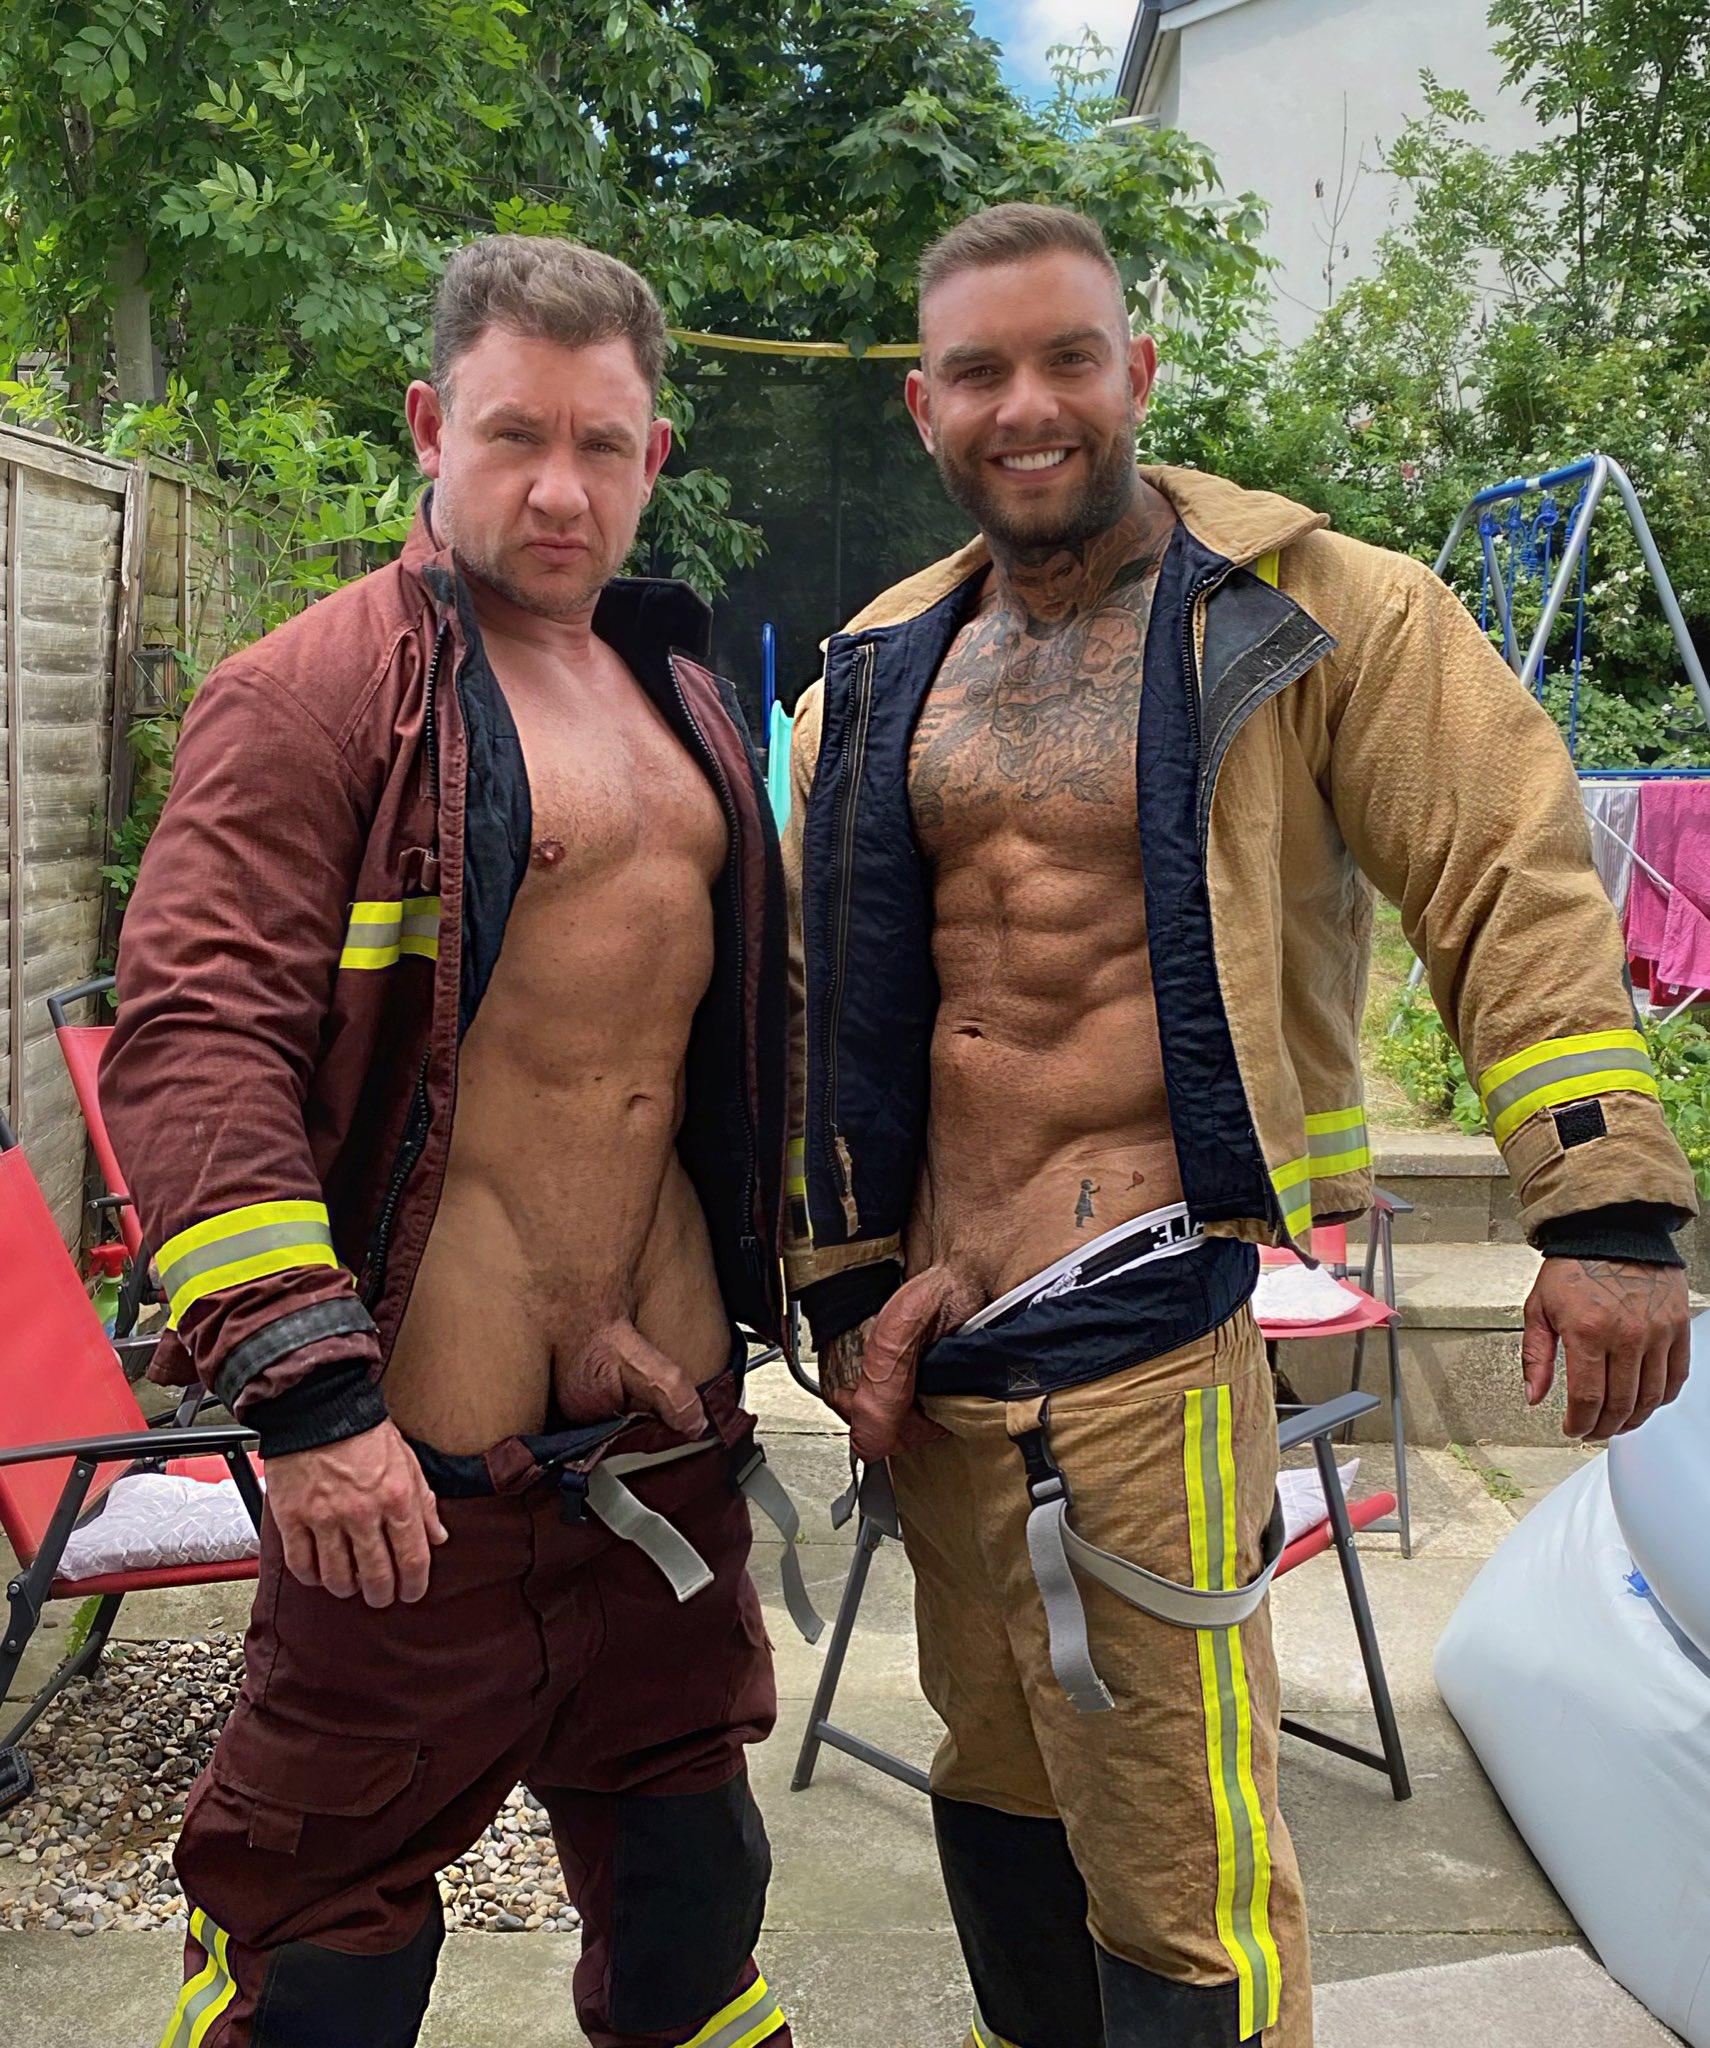 bomberos y sus vergas